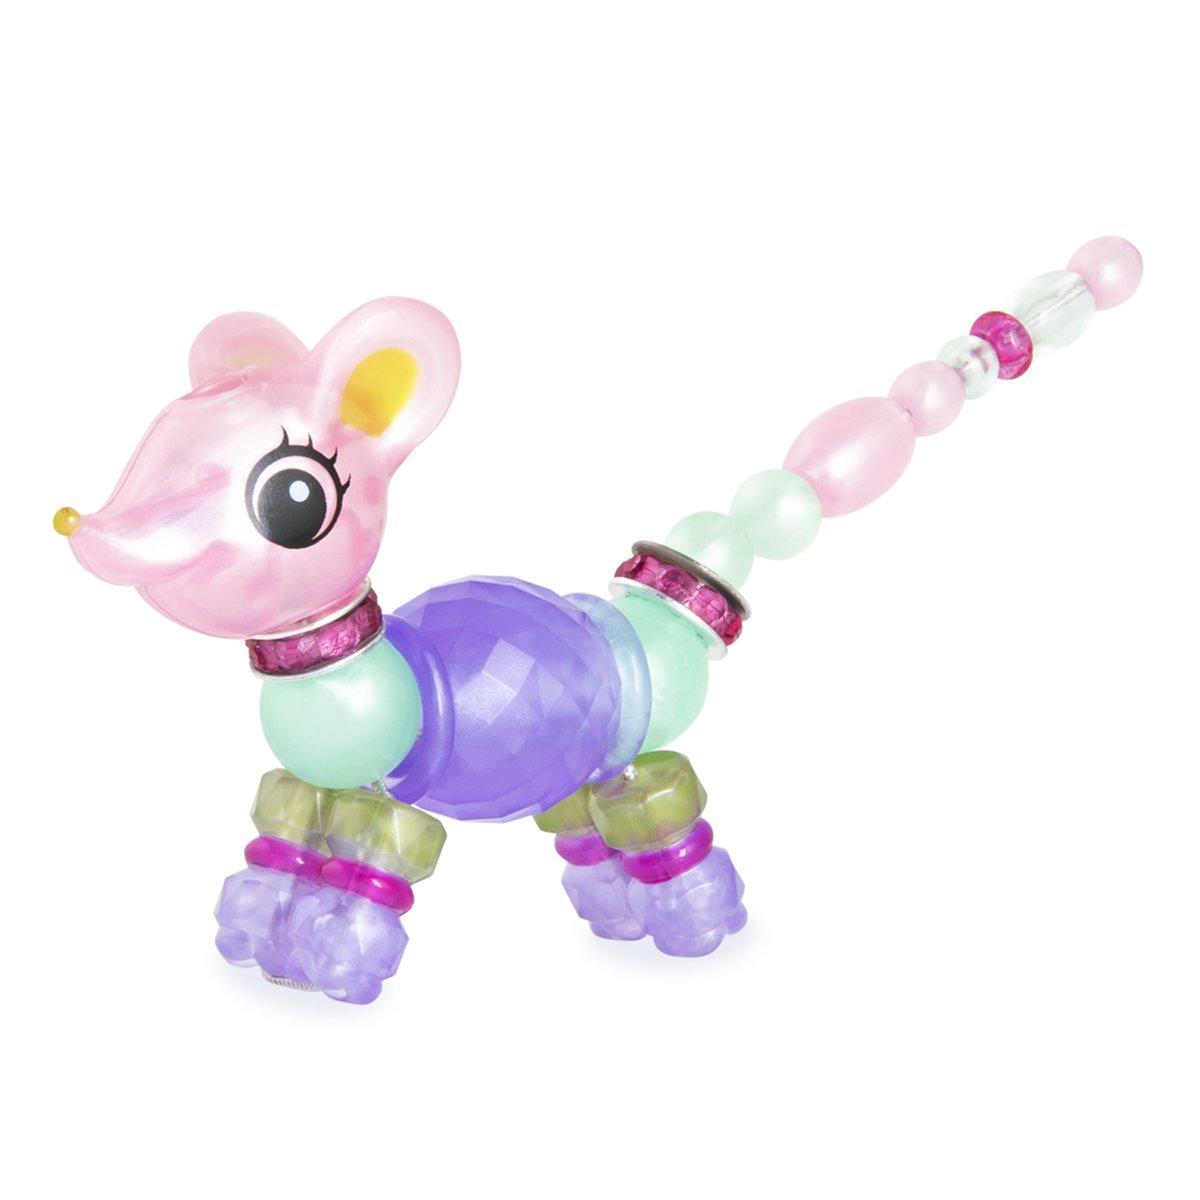 Браслет-игрушка Twisty Petz Muffins Mouse 20105839 ТМ: Twisty Petz